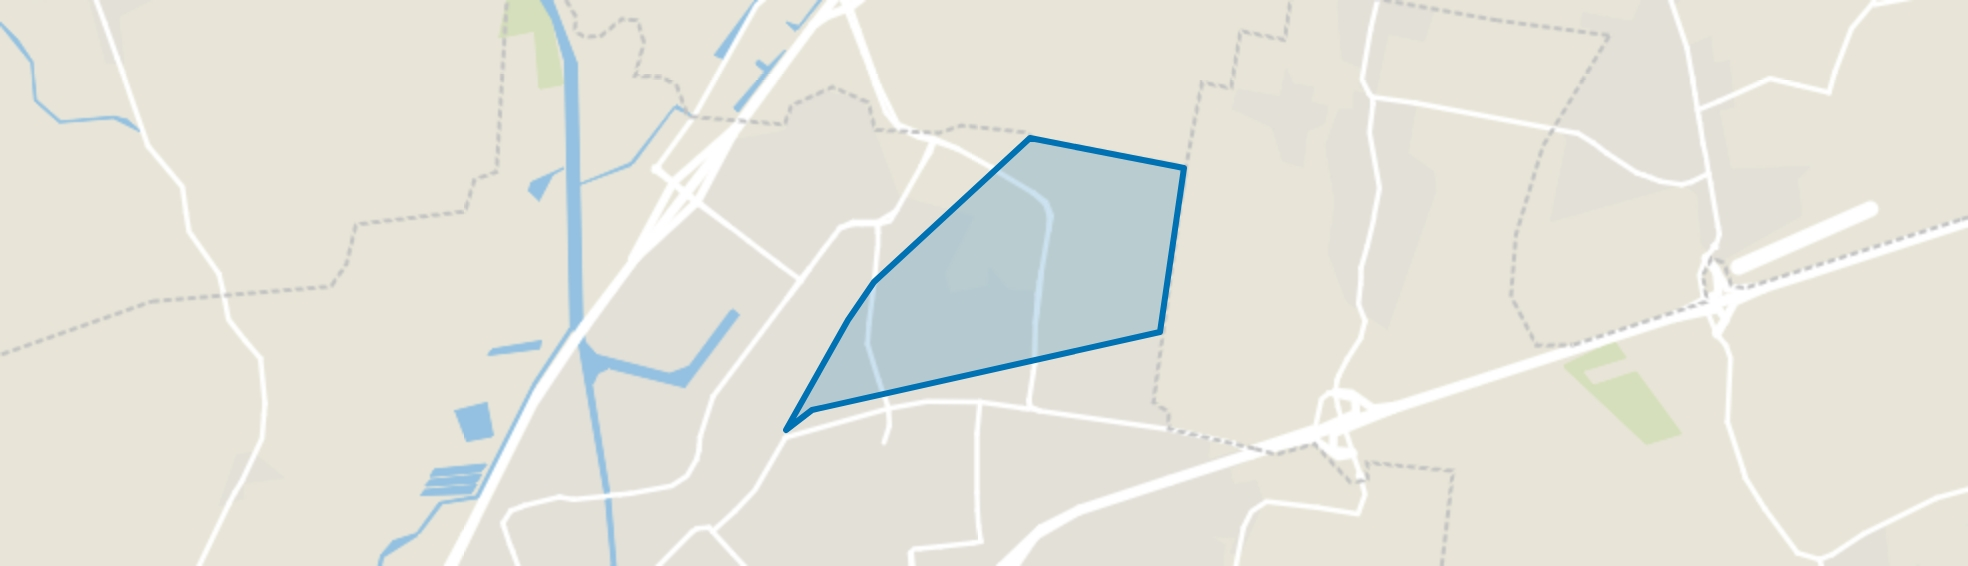 Nieuwenberg, Roosendaal map